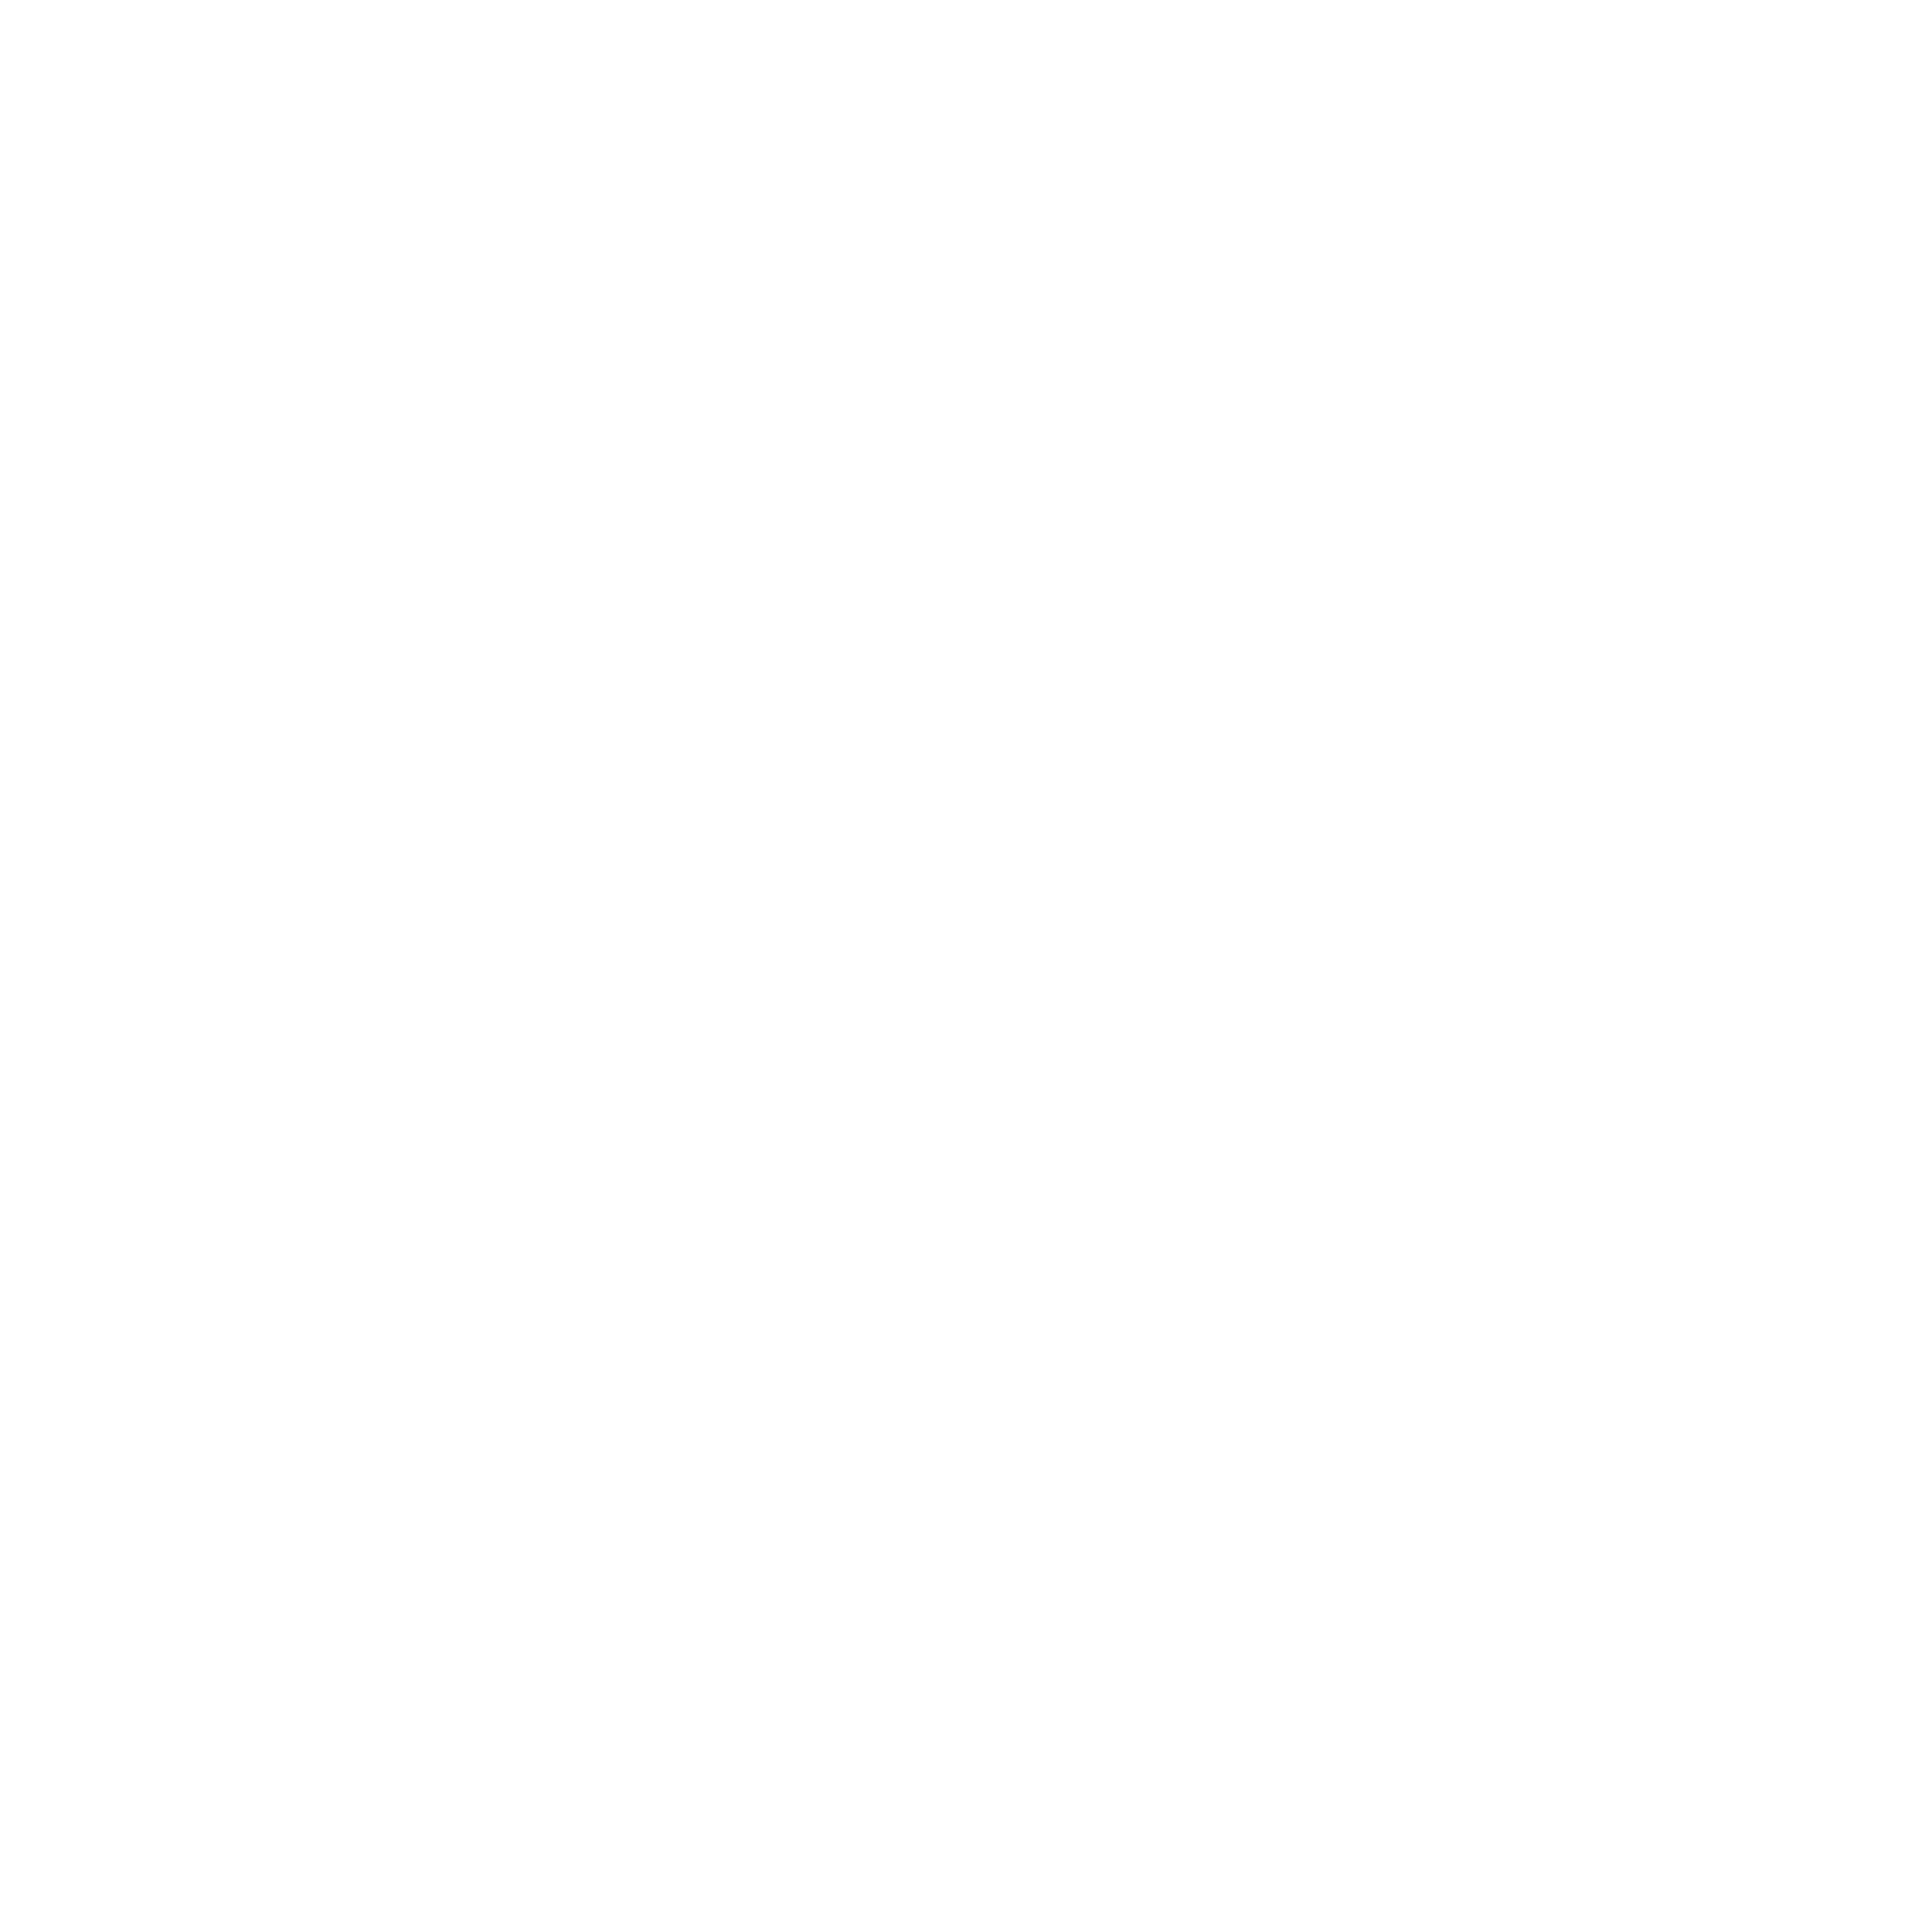 Bolso bandolera Phoenix amsterdam para portátil tablet hasta 14″ y ultrabook hasta 15.6″ negro